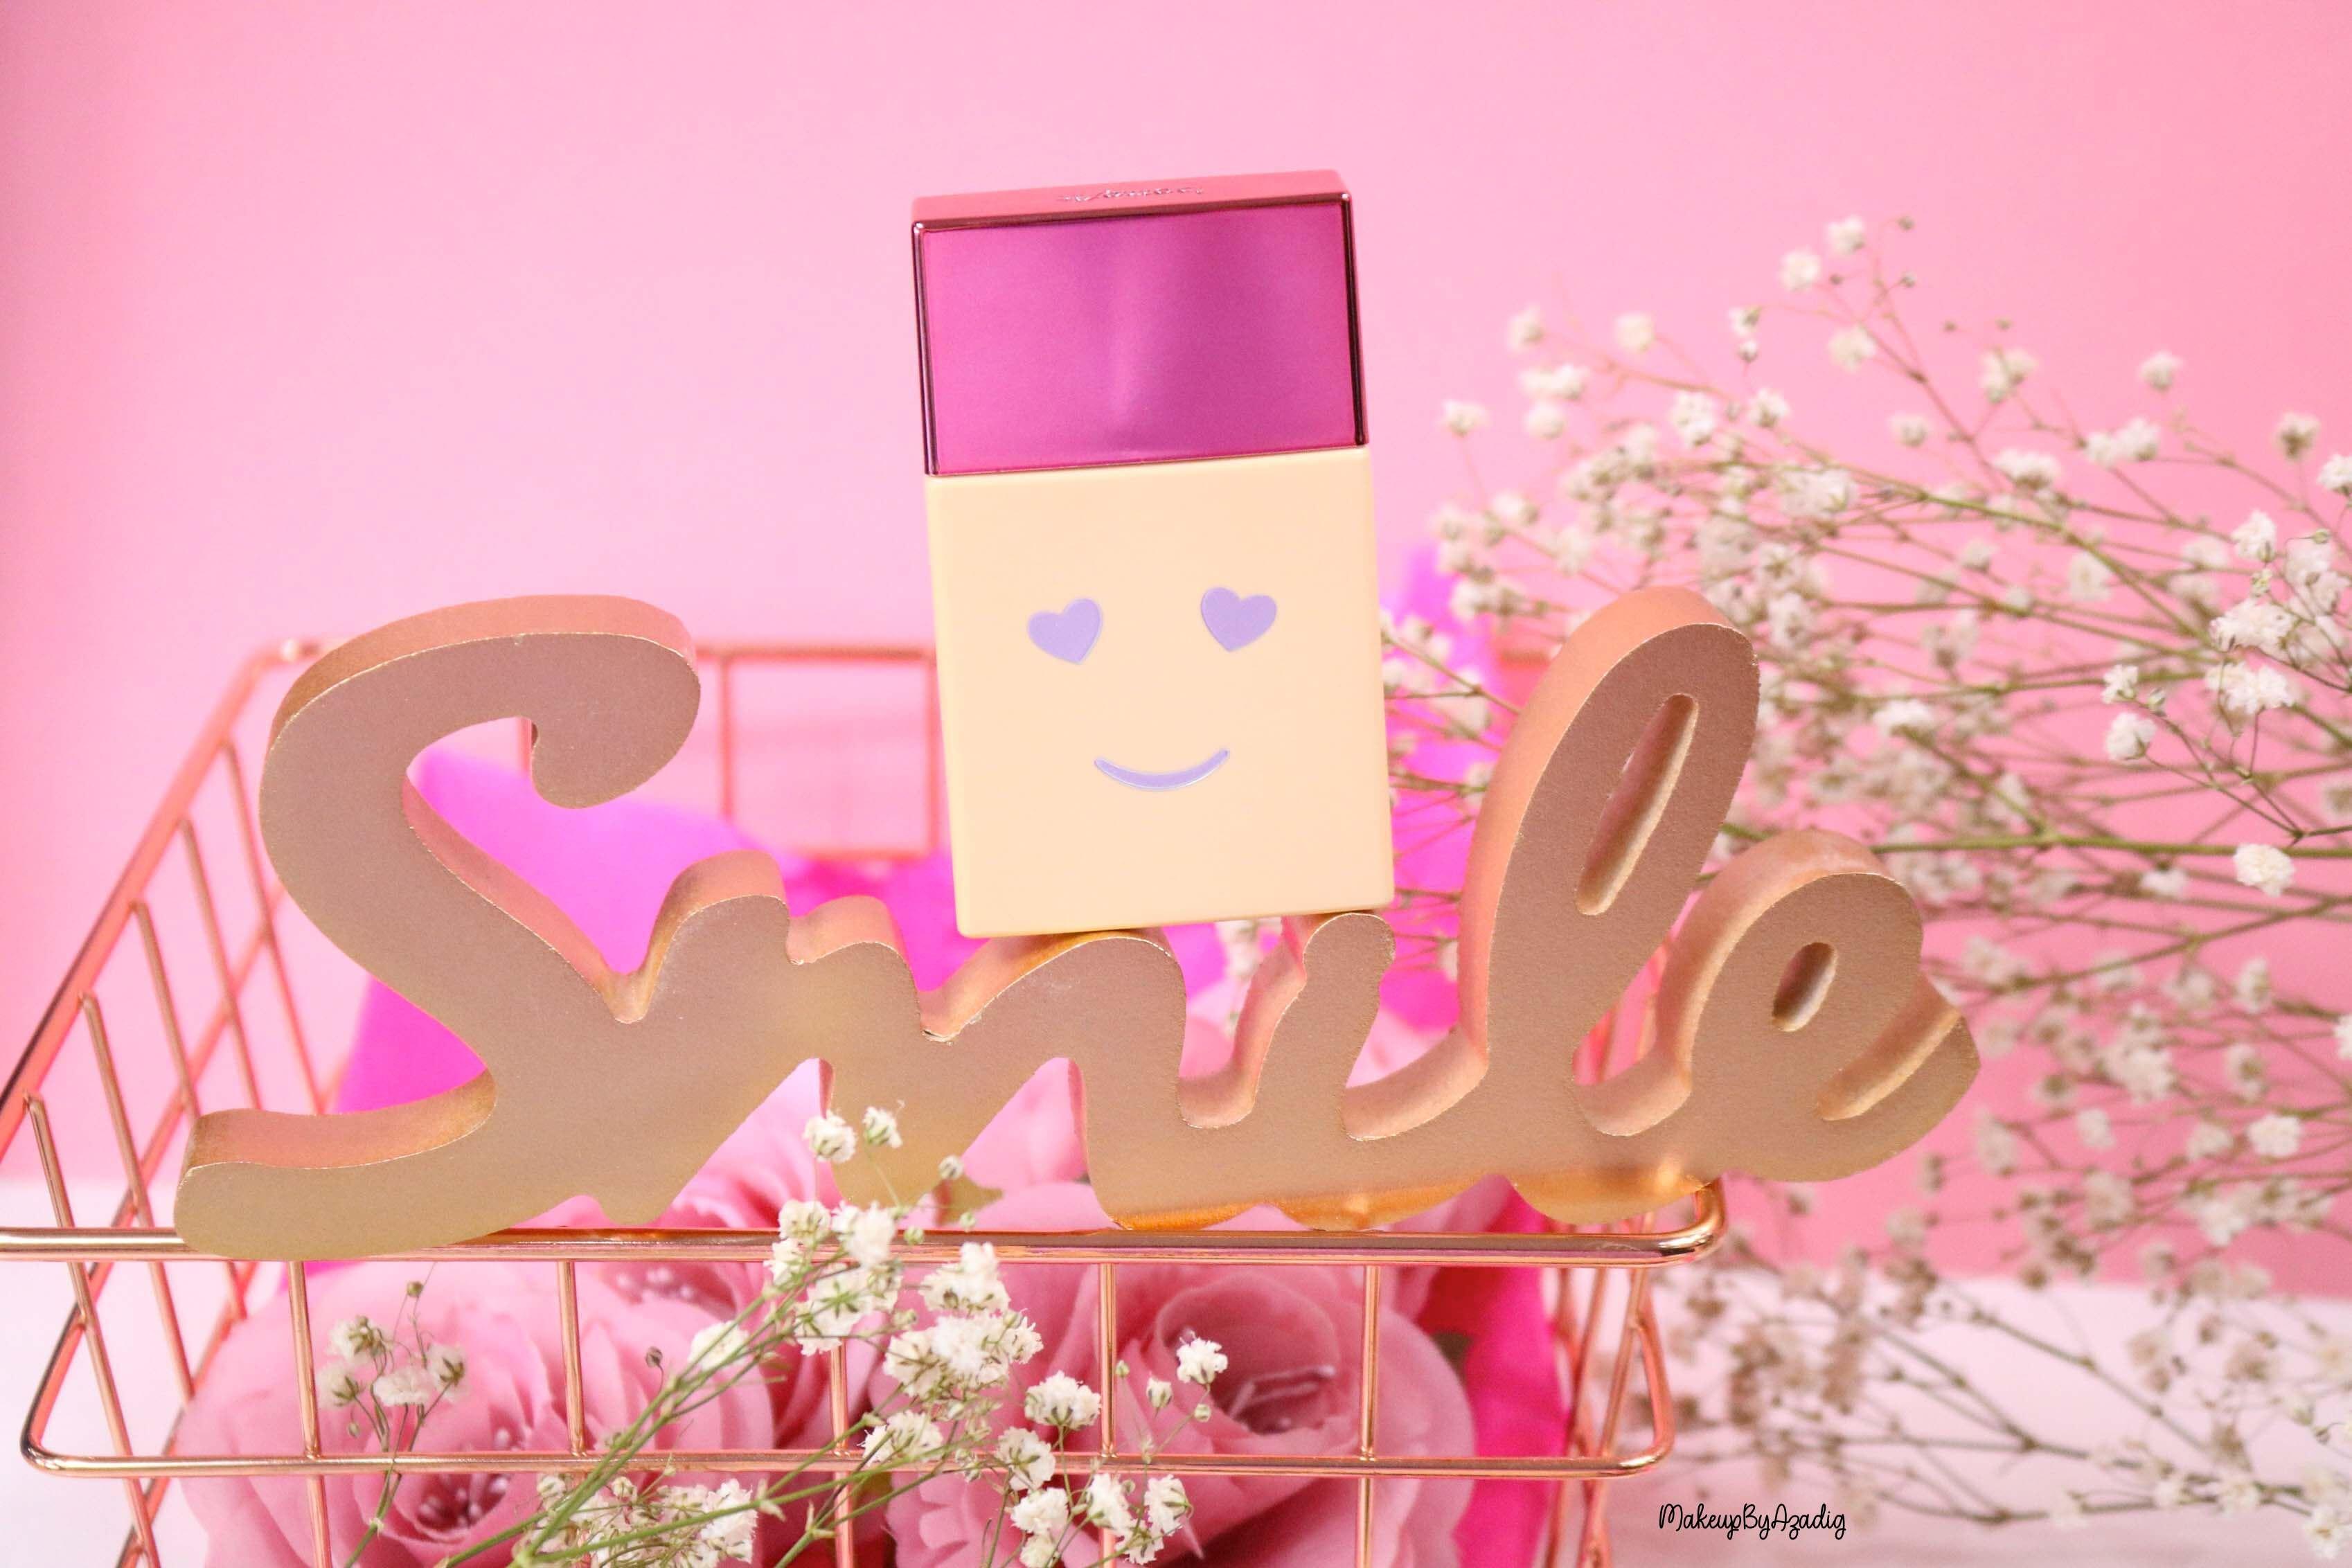 revue-nouveau-fond-de-teint-hello-happy-benefit-sephora-prix-avis-teintes-makeupbyazadig-test